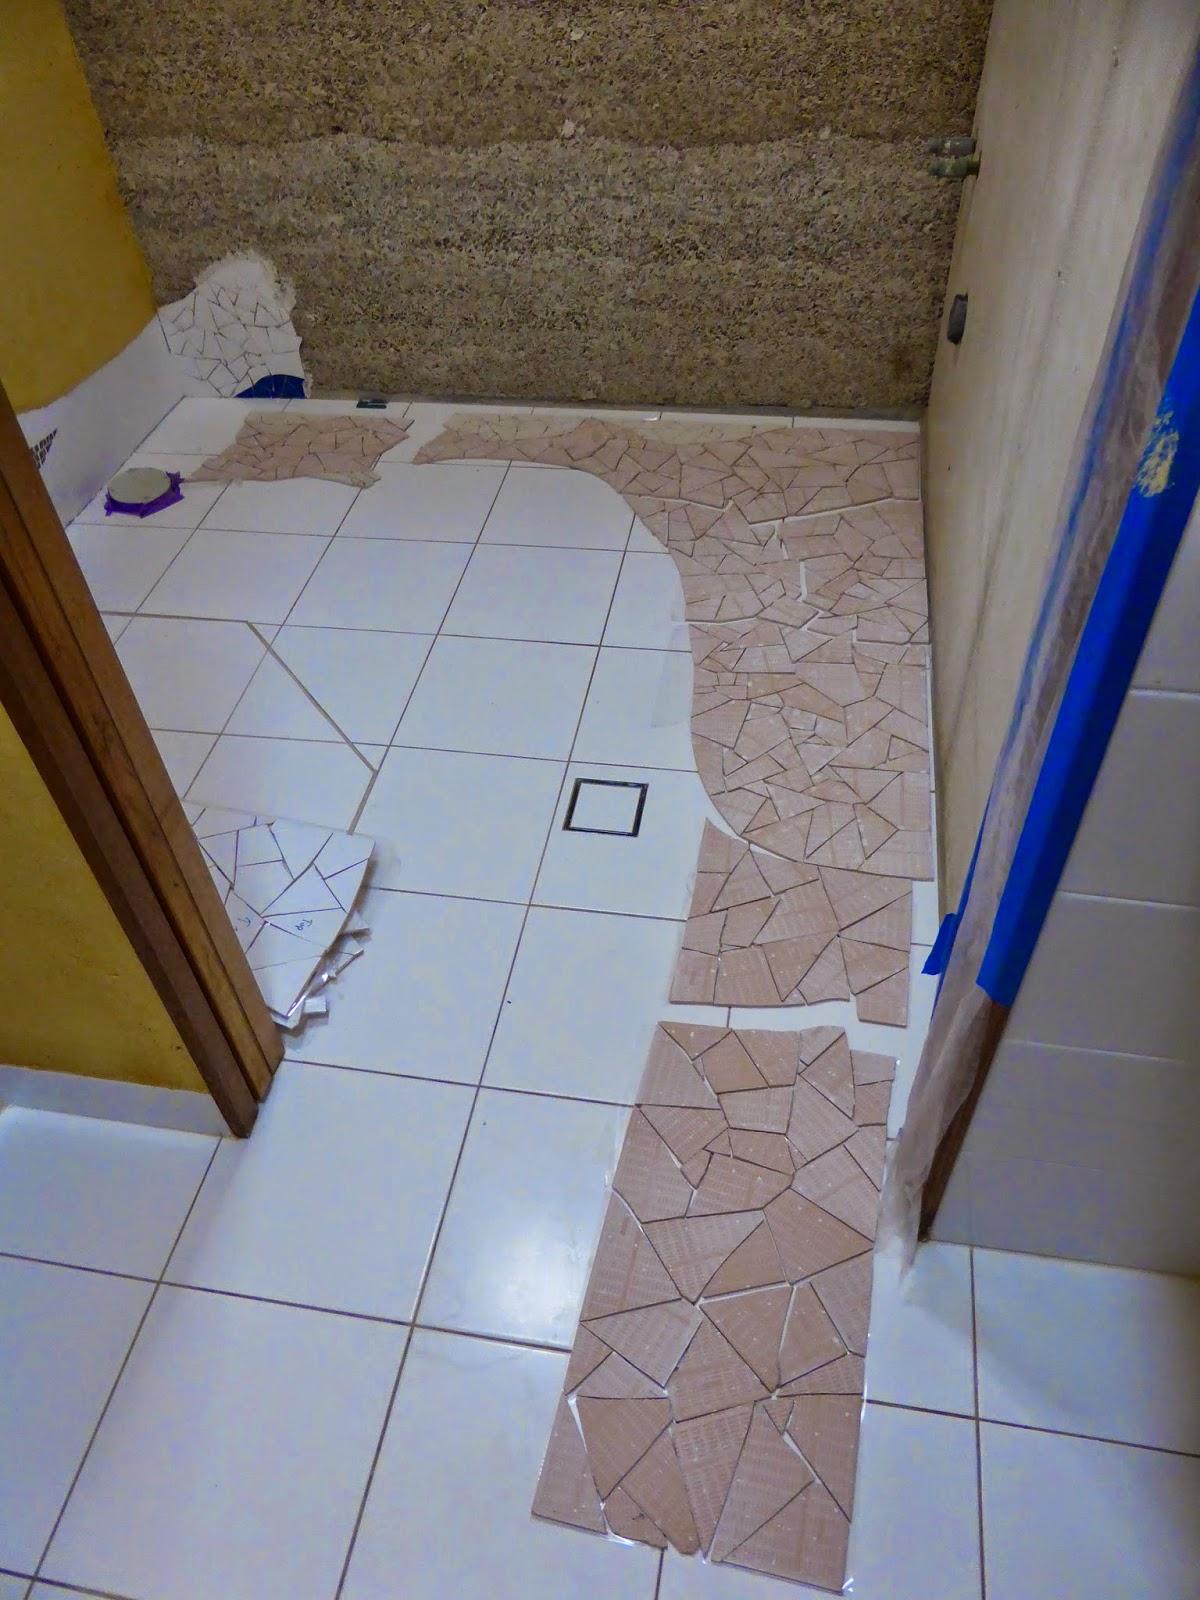 Culburra Hemp House: Tiling on Hemp Walls